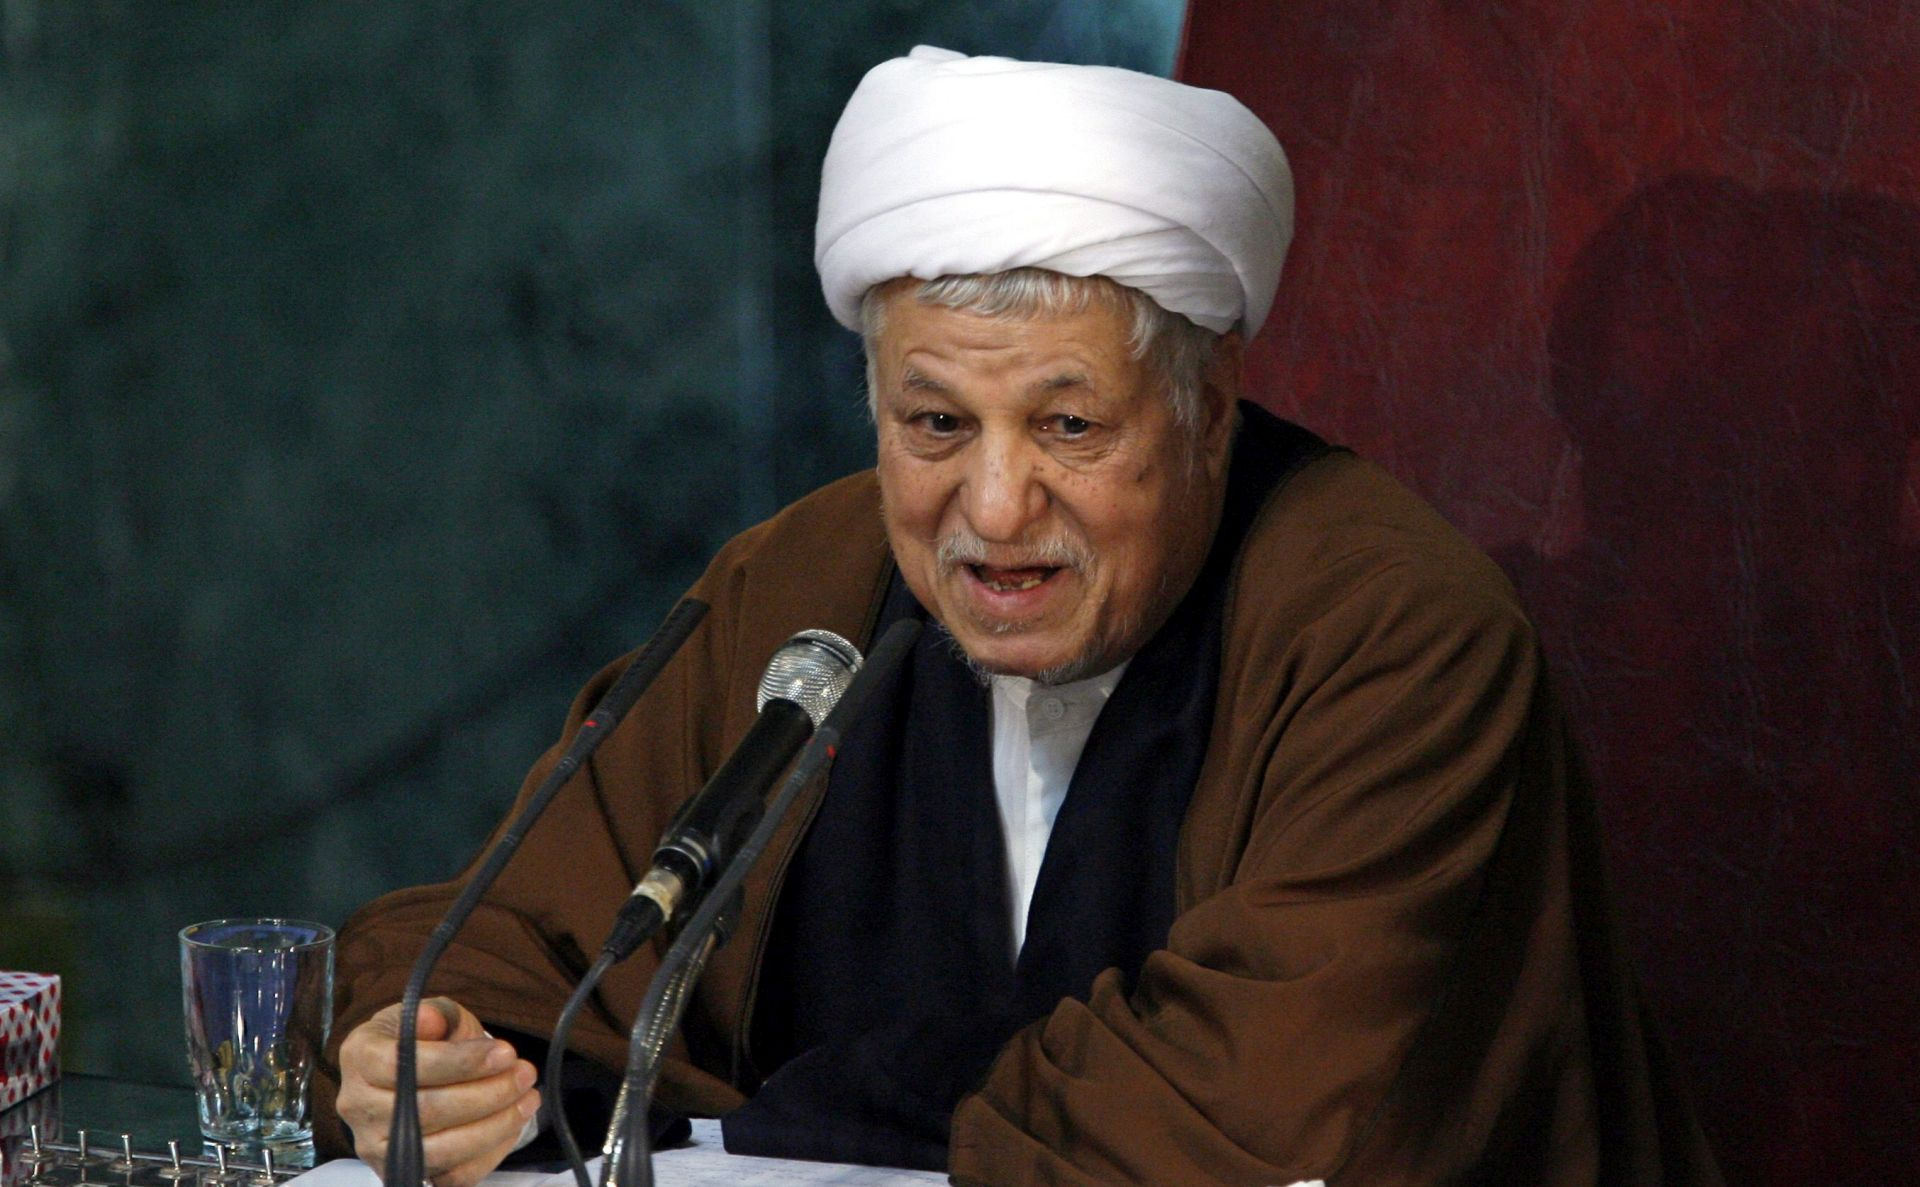 Preminuo nekadašnji iranski predsjednik Ali Akbar Hashemi Rafsanjani